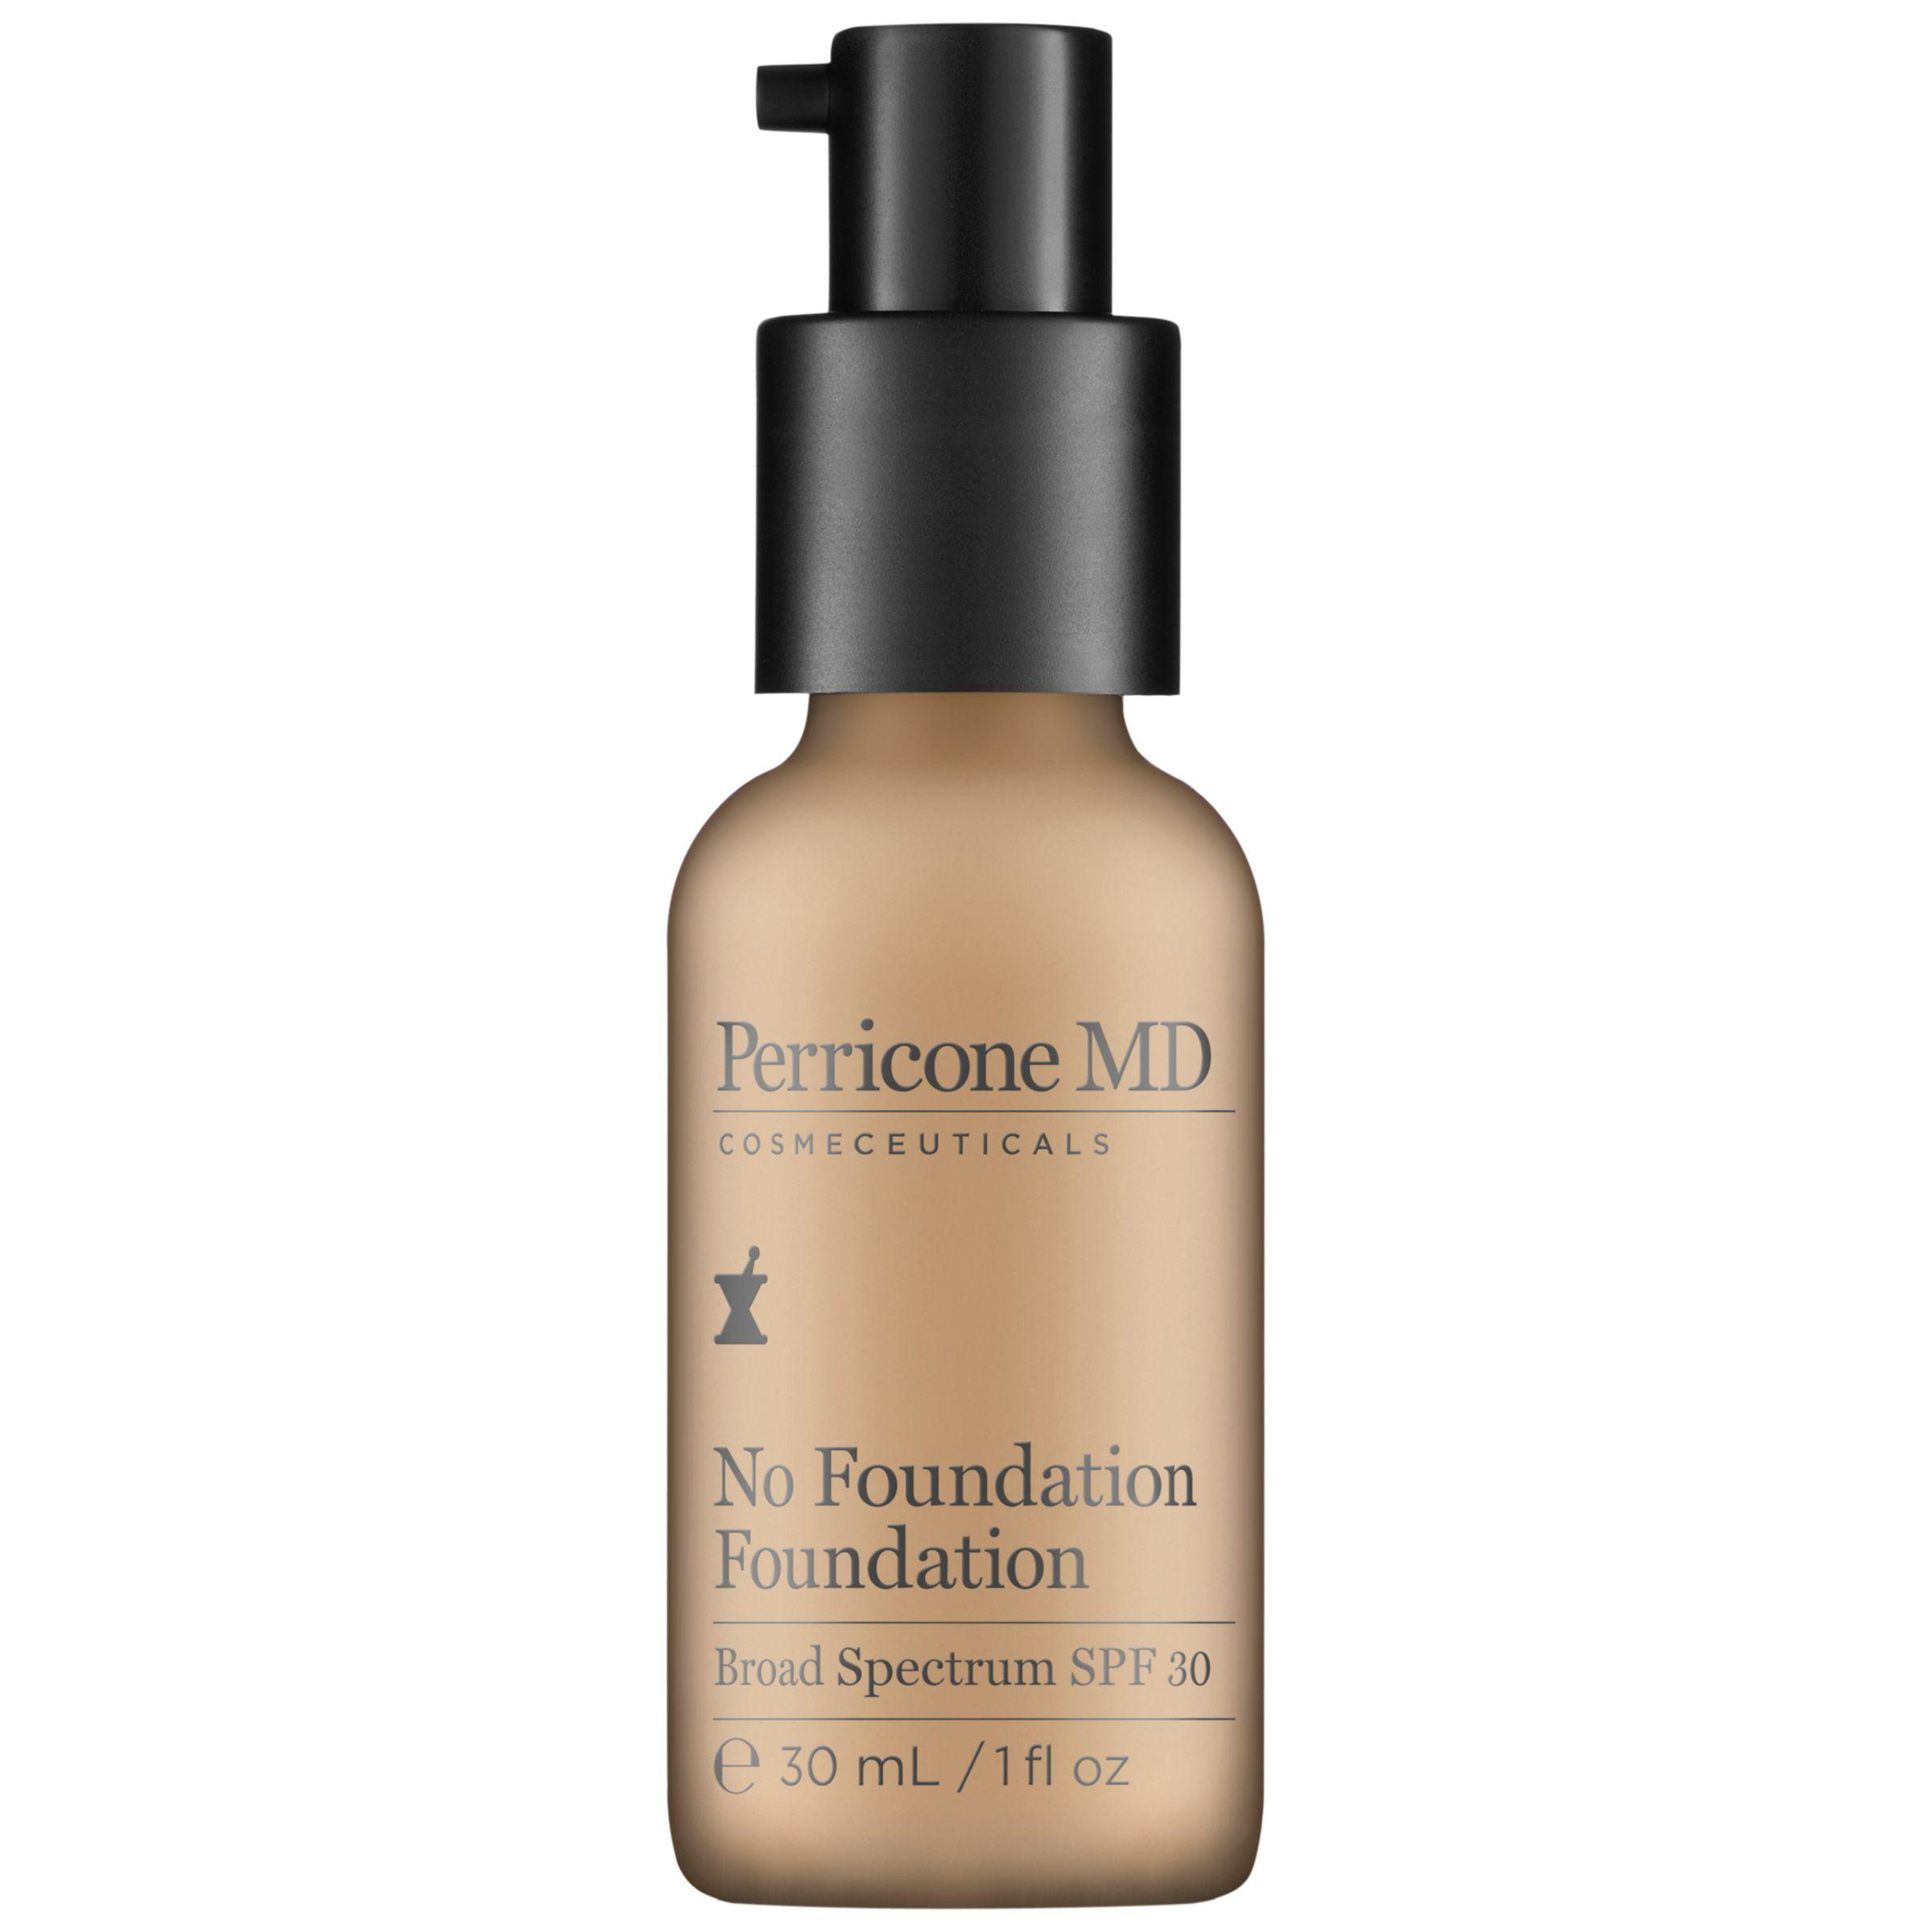 Perricone MD Perricone MD No Foundation Foundation, 30ml